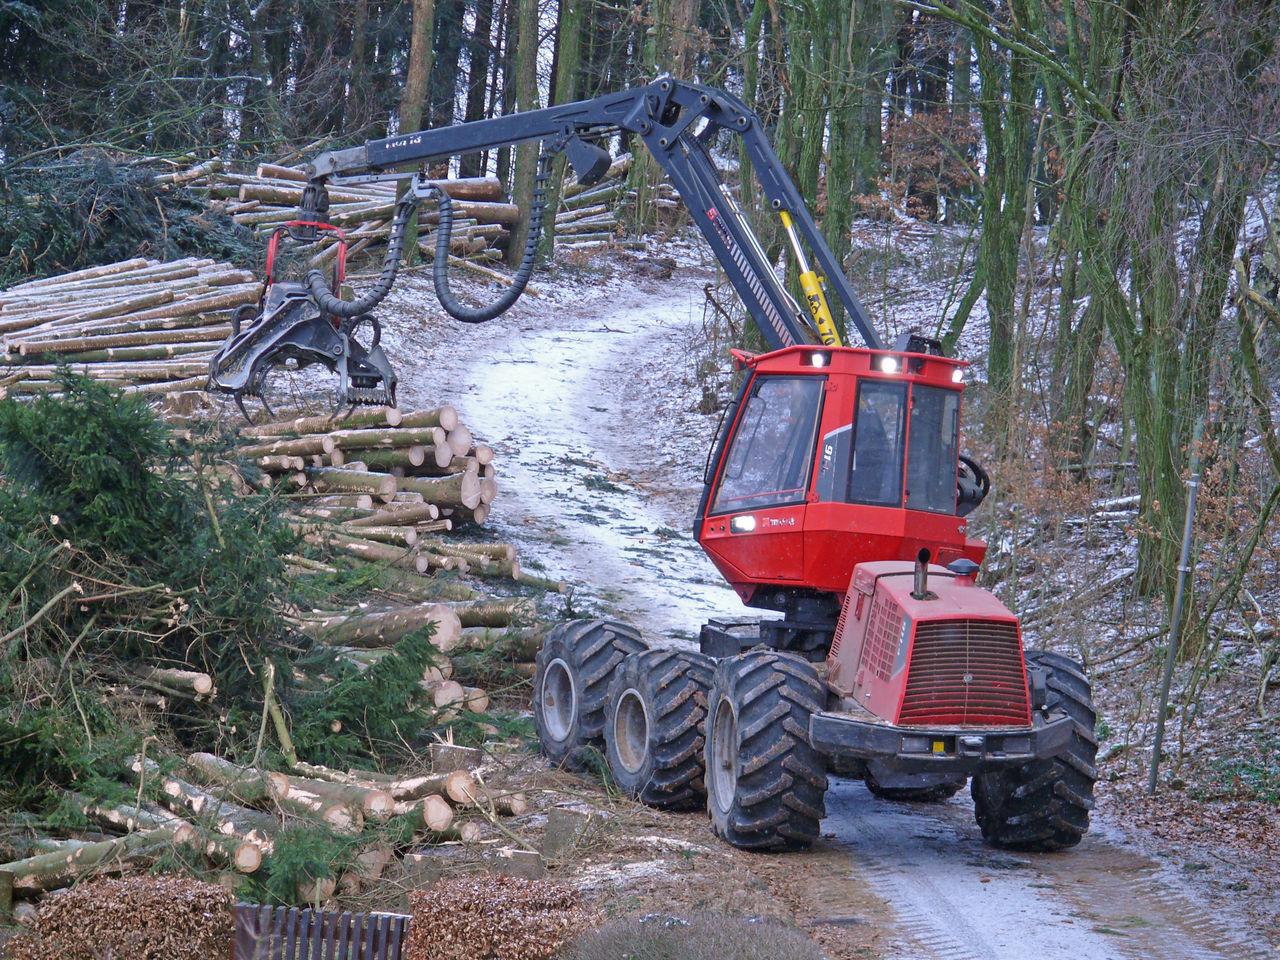 Arbeitskopf Fichtenwald Harvester Holzvollernter Industry Kranvollernter Machinery MB Trac 1600 Turbo Nature No People Outdoors Red Tree Tree Wald Waldmaschine Waldvollernter